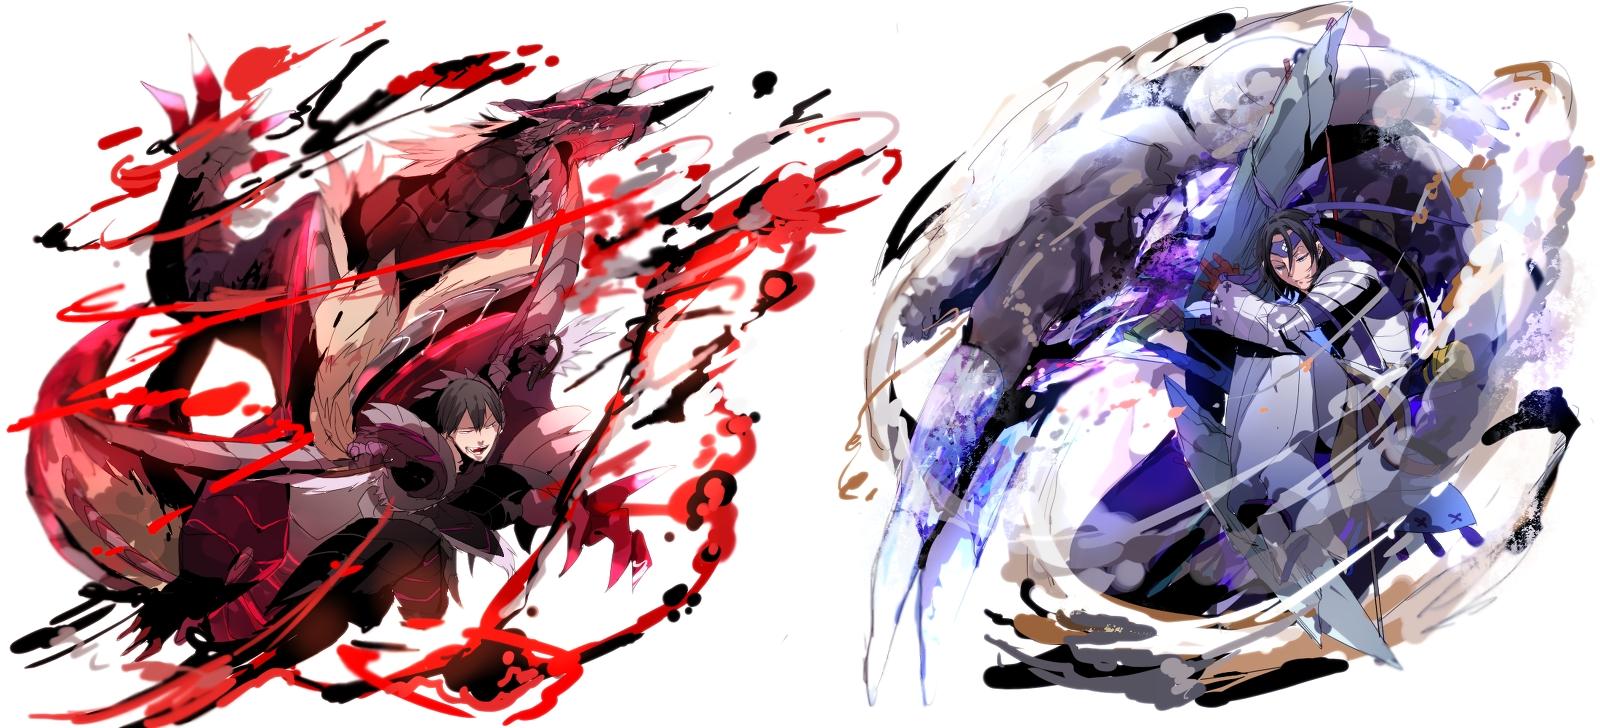 Monster Hunter Characters Wallpaper 16 Fav Yowamushi Pedal